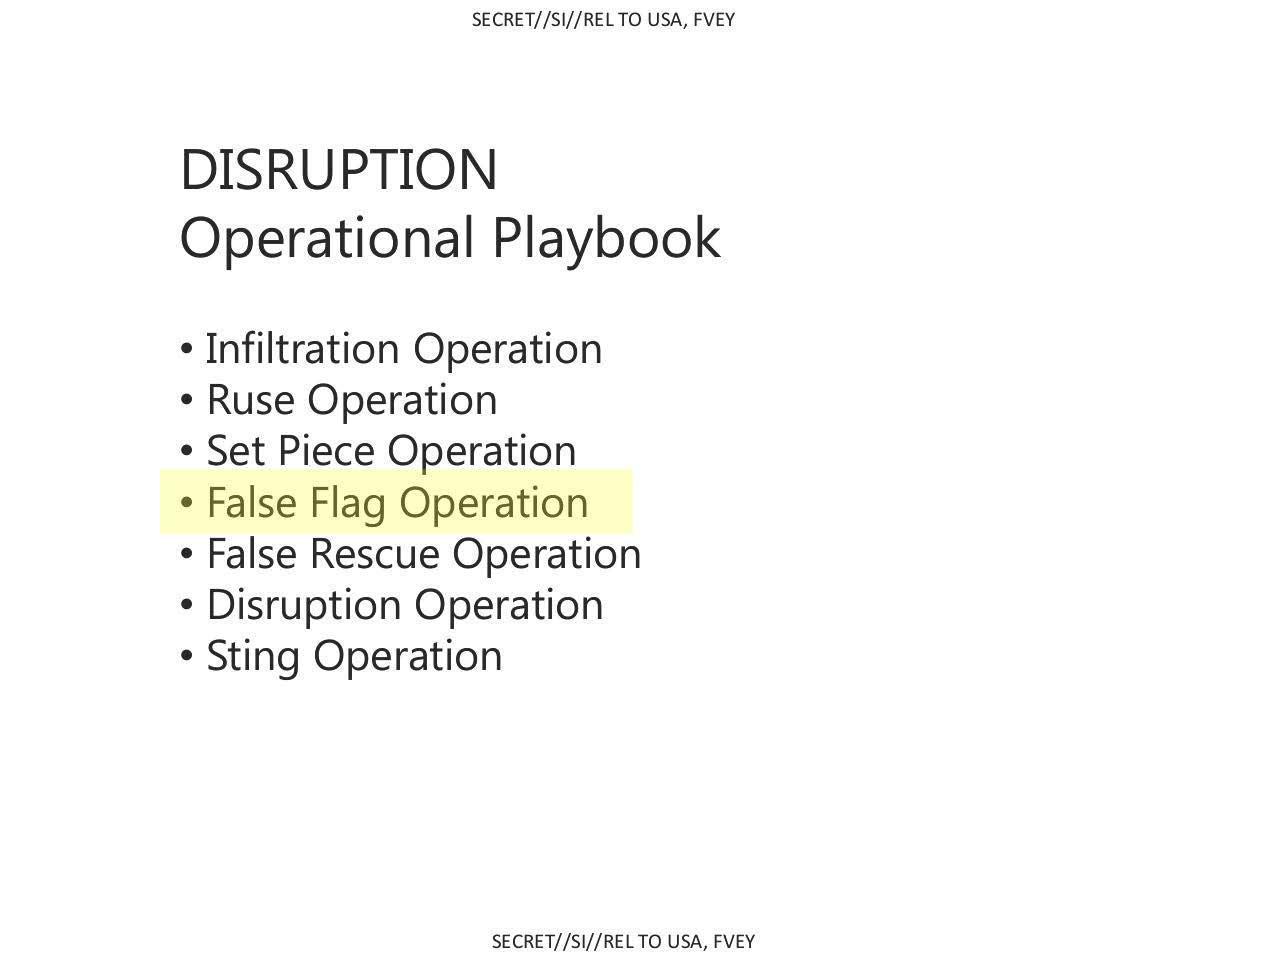 Operational Playbook Includes False Flag